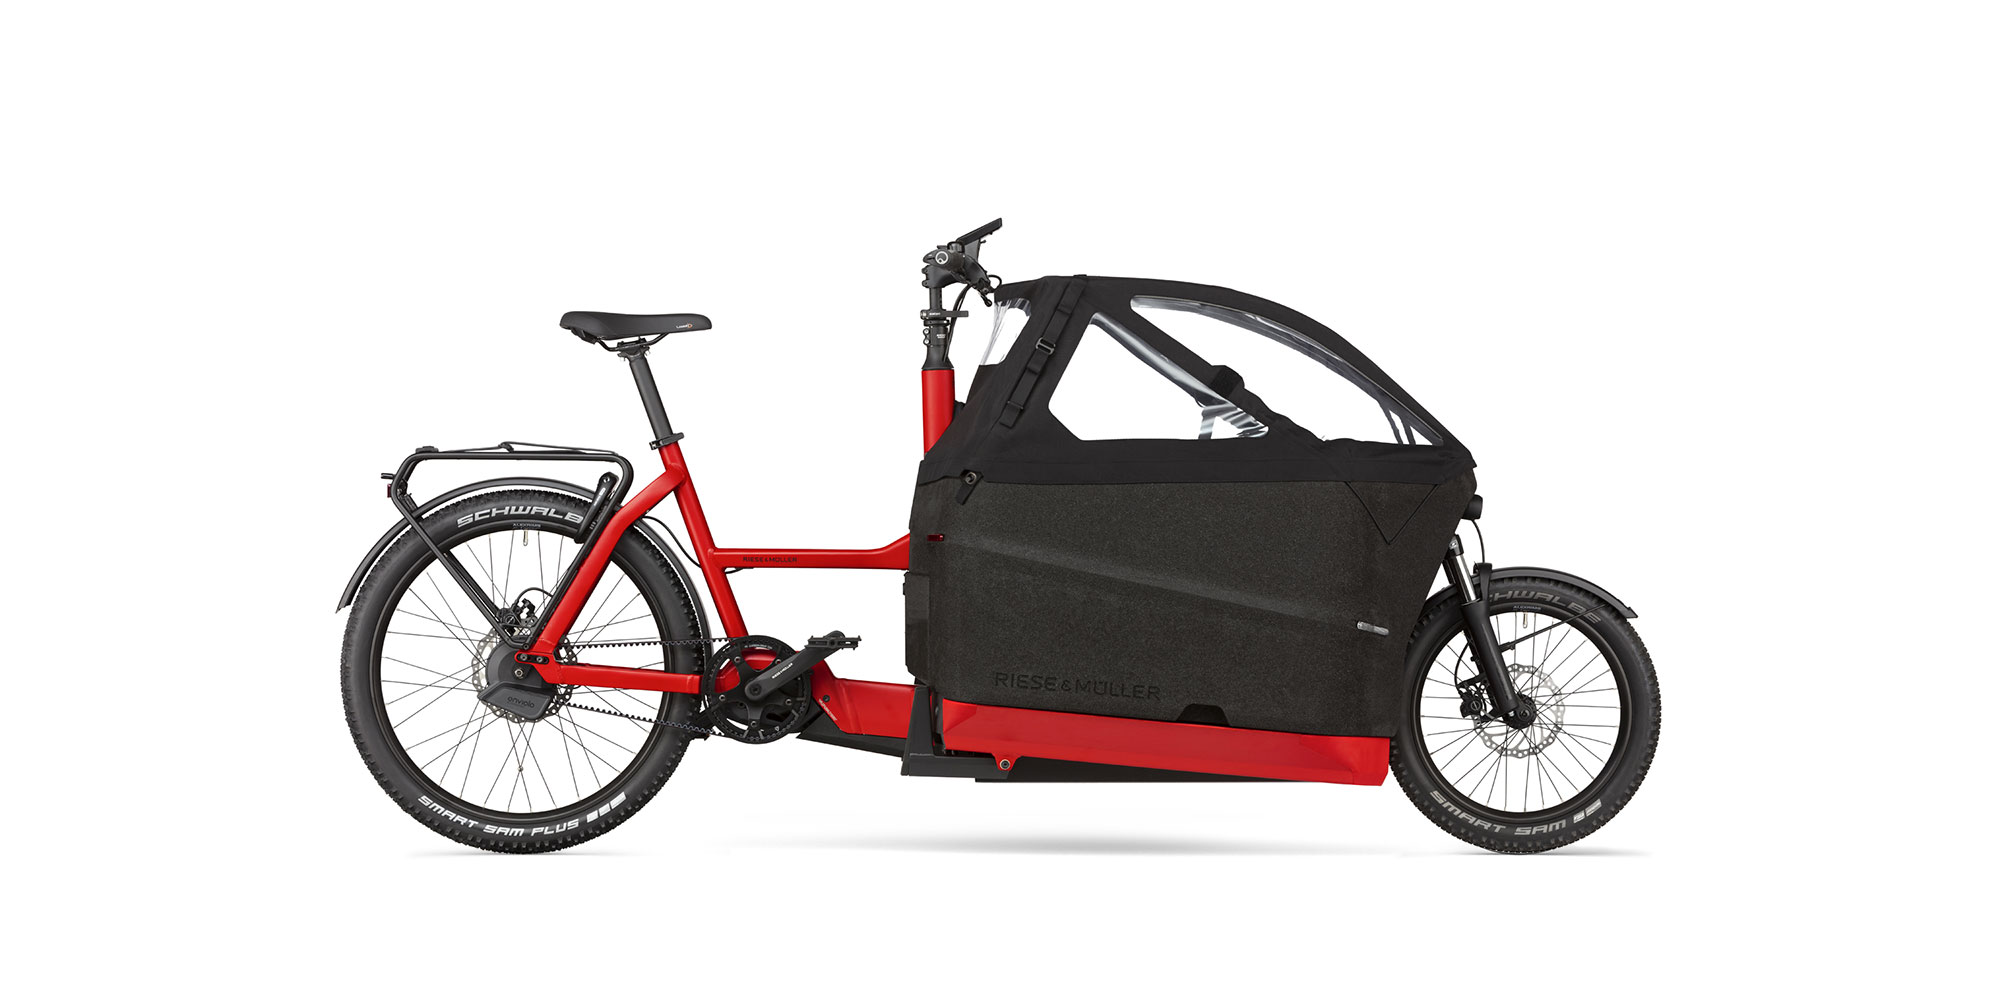 Riese Müller 2021 F00522 Packster 70 Enviolo Automatic GX Nyon Kindersitz Kinderverdeck geschlossen